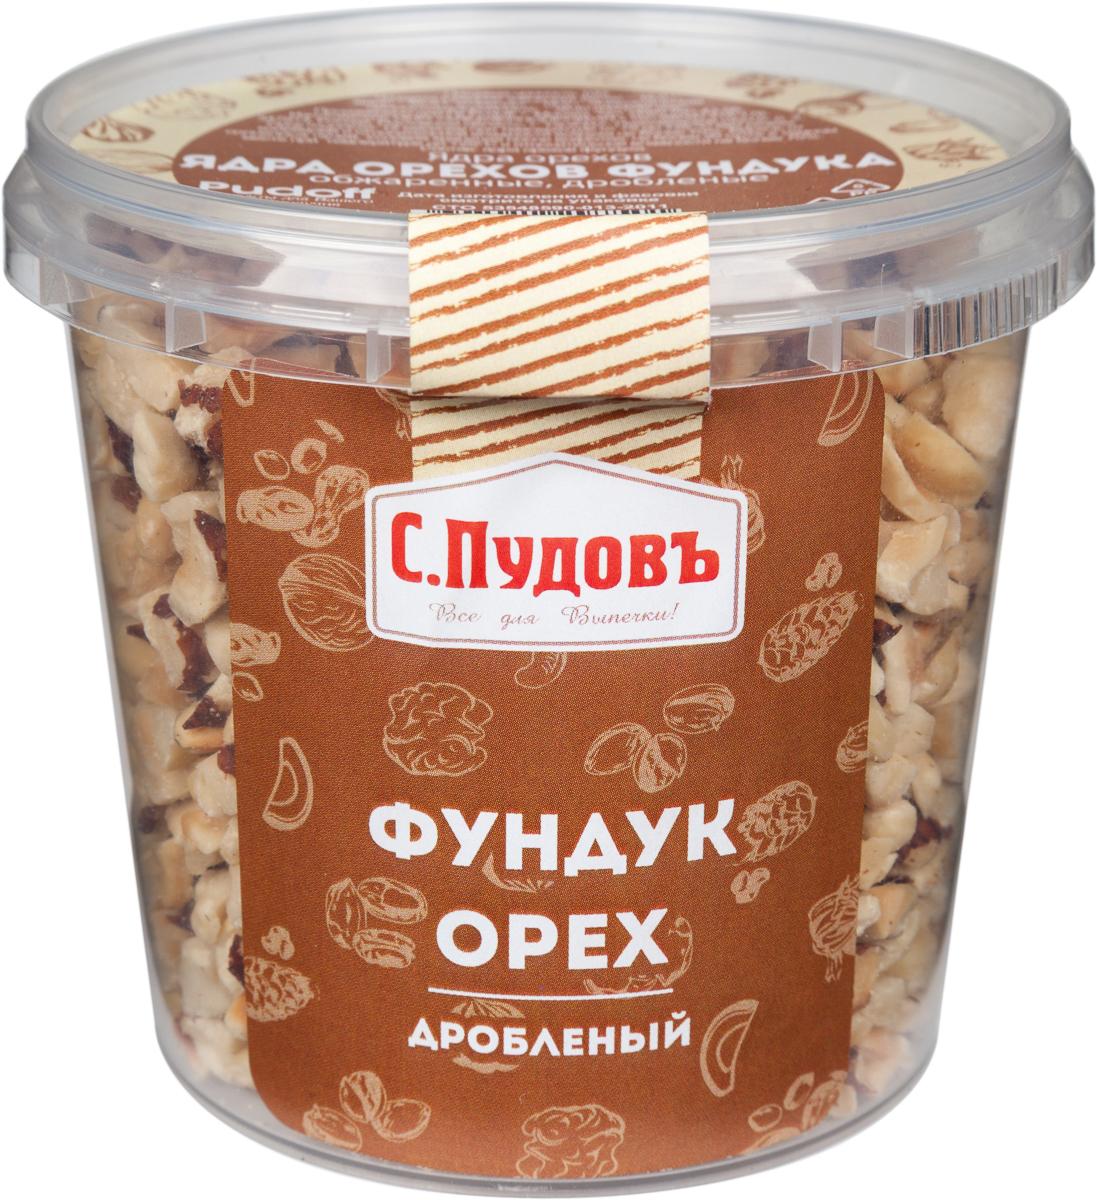 Пудовъ фундук дробленый, 180 г пудовъ ванильный сахар 60 штук по 15 г